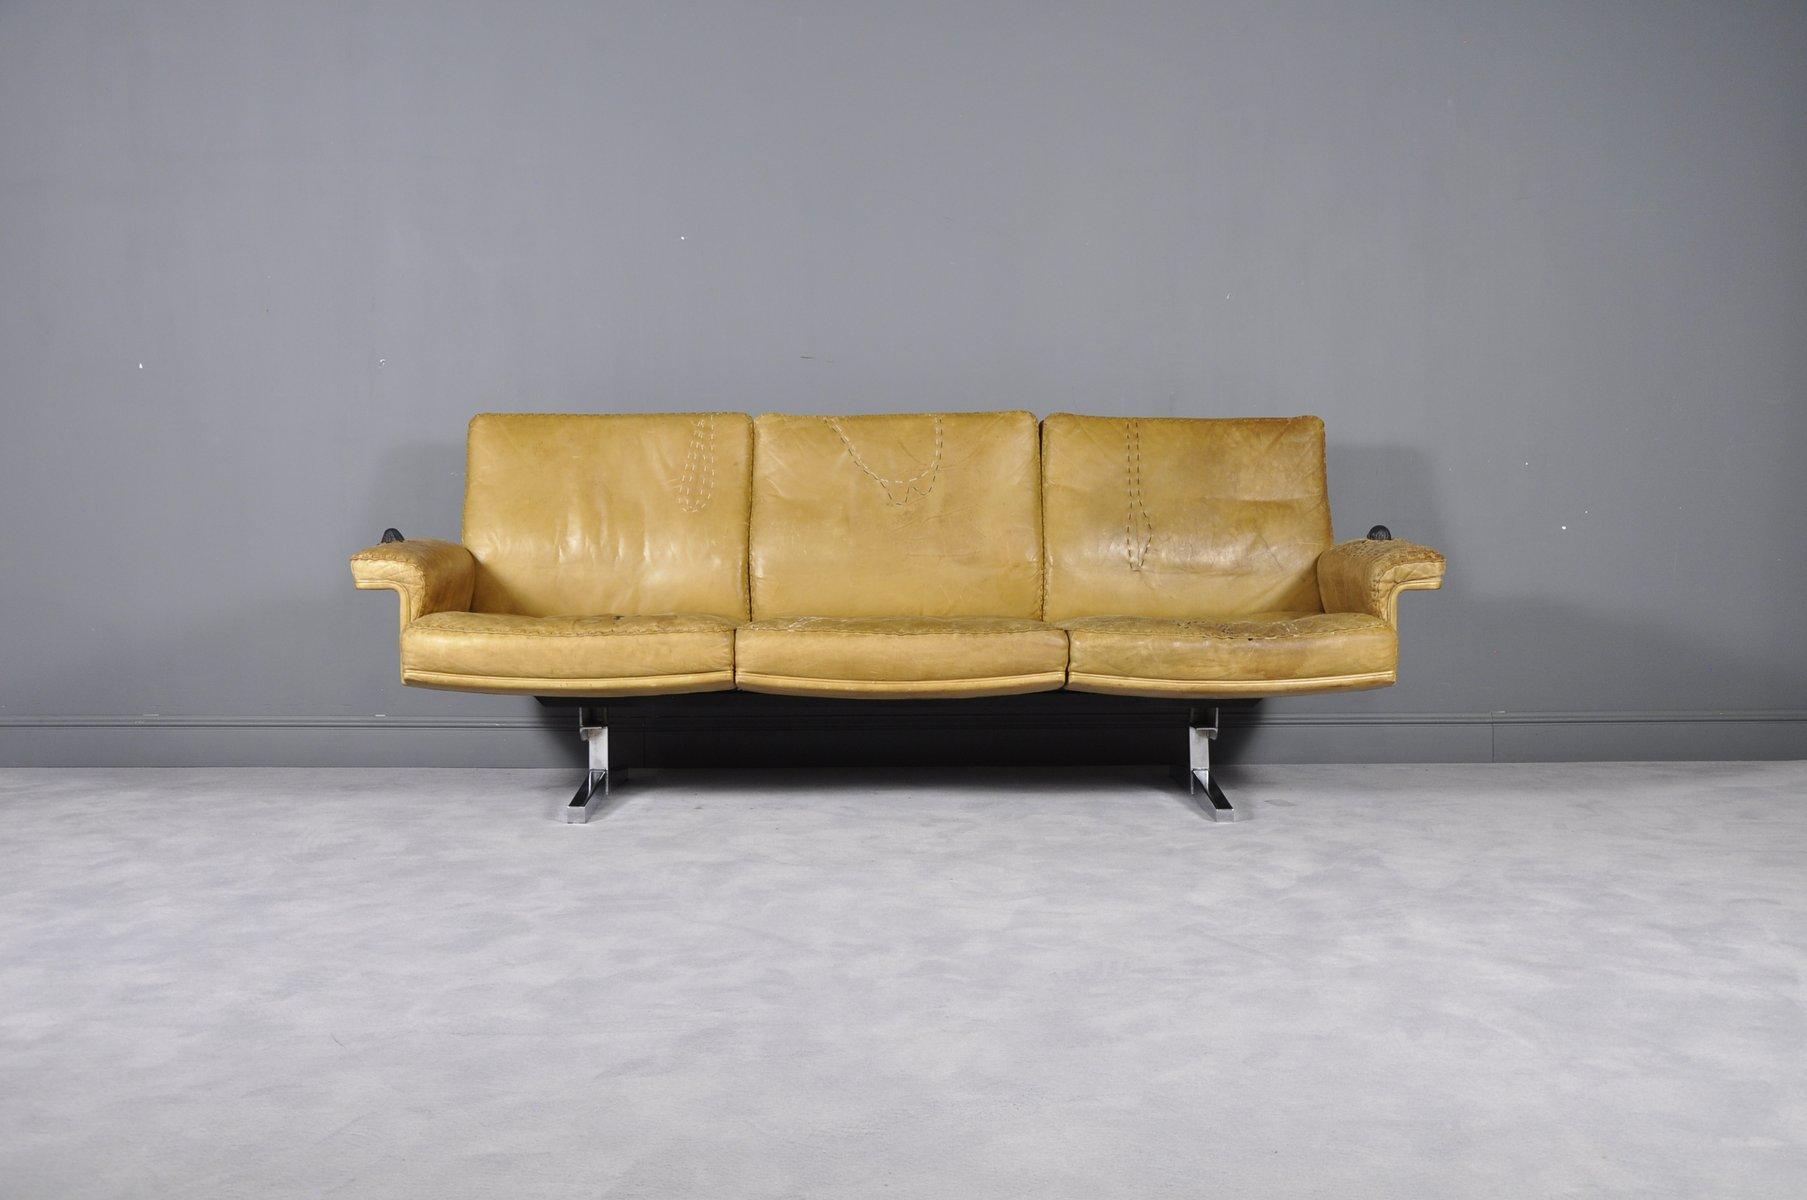 Full Size of De Sede Sofa Usa Sessel Gebraucht Schweiz Furniture Uk Endless Ds 600 Bi Kaufen Preise Preisliste 35 3 Sitzer Von Lederpflege Waschbecken Badezimmer Sofa De Sede Sofa